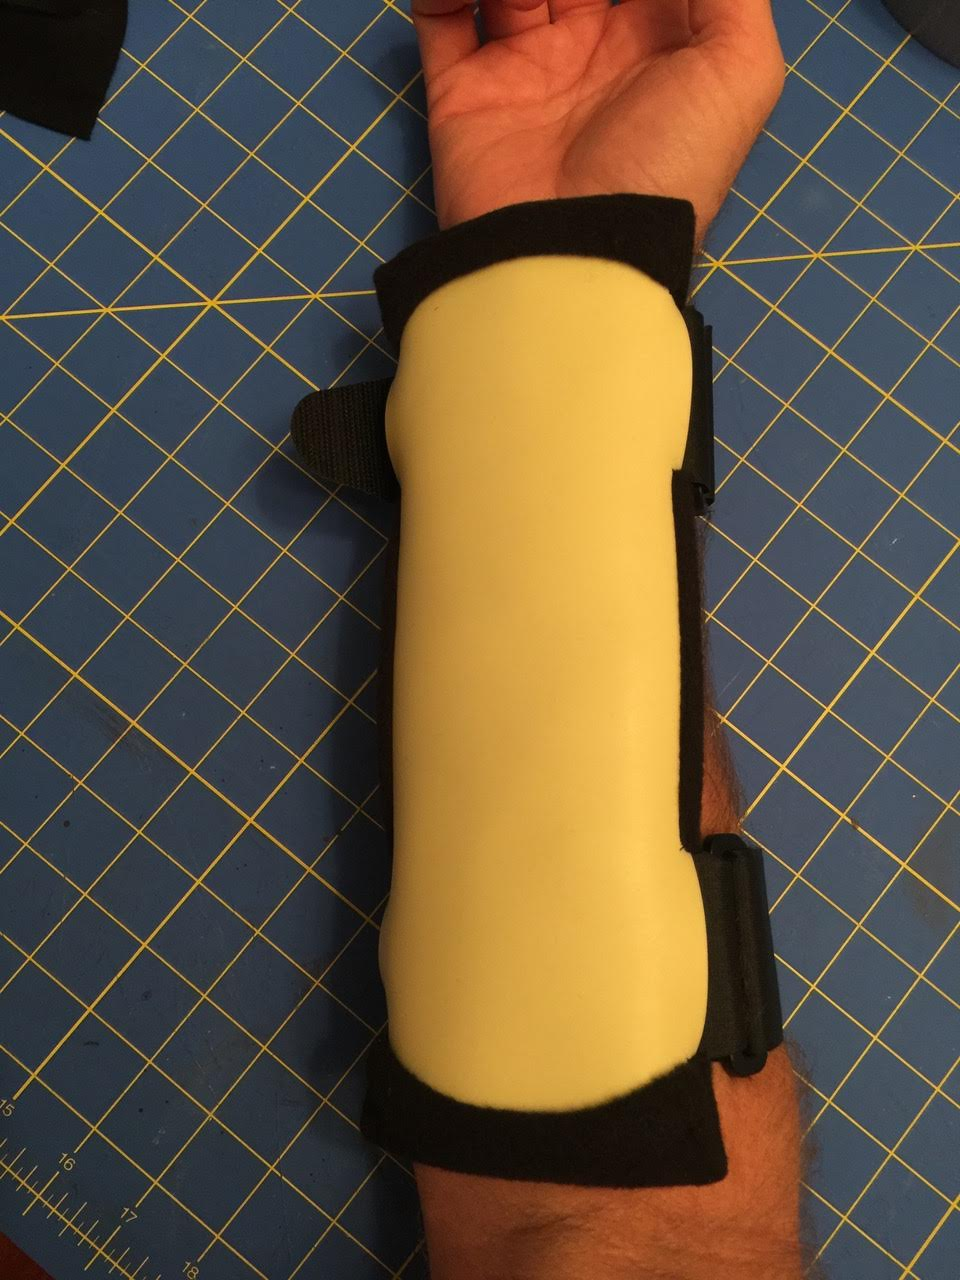 ReaLifeSim Vas-Sleeve anterior forearm (1).jpg